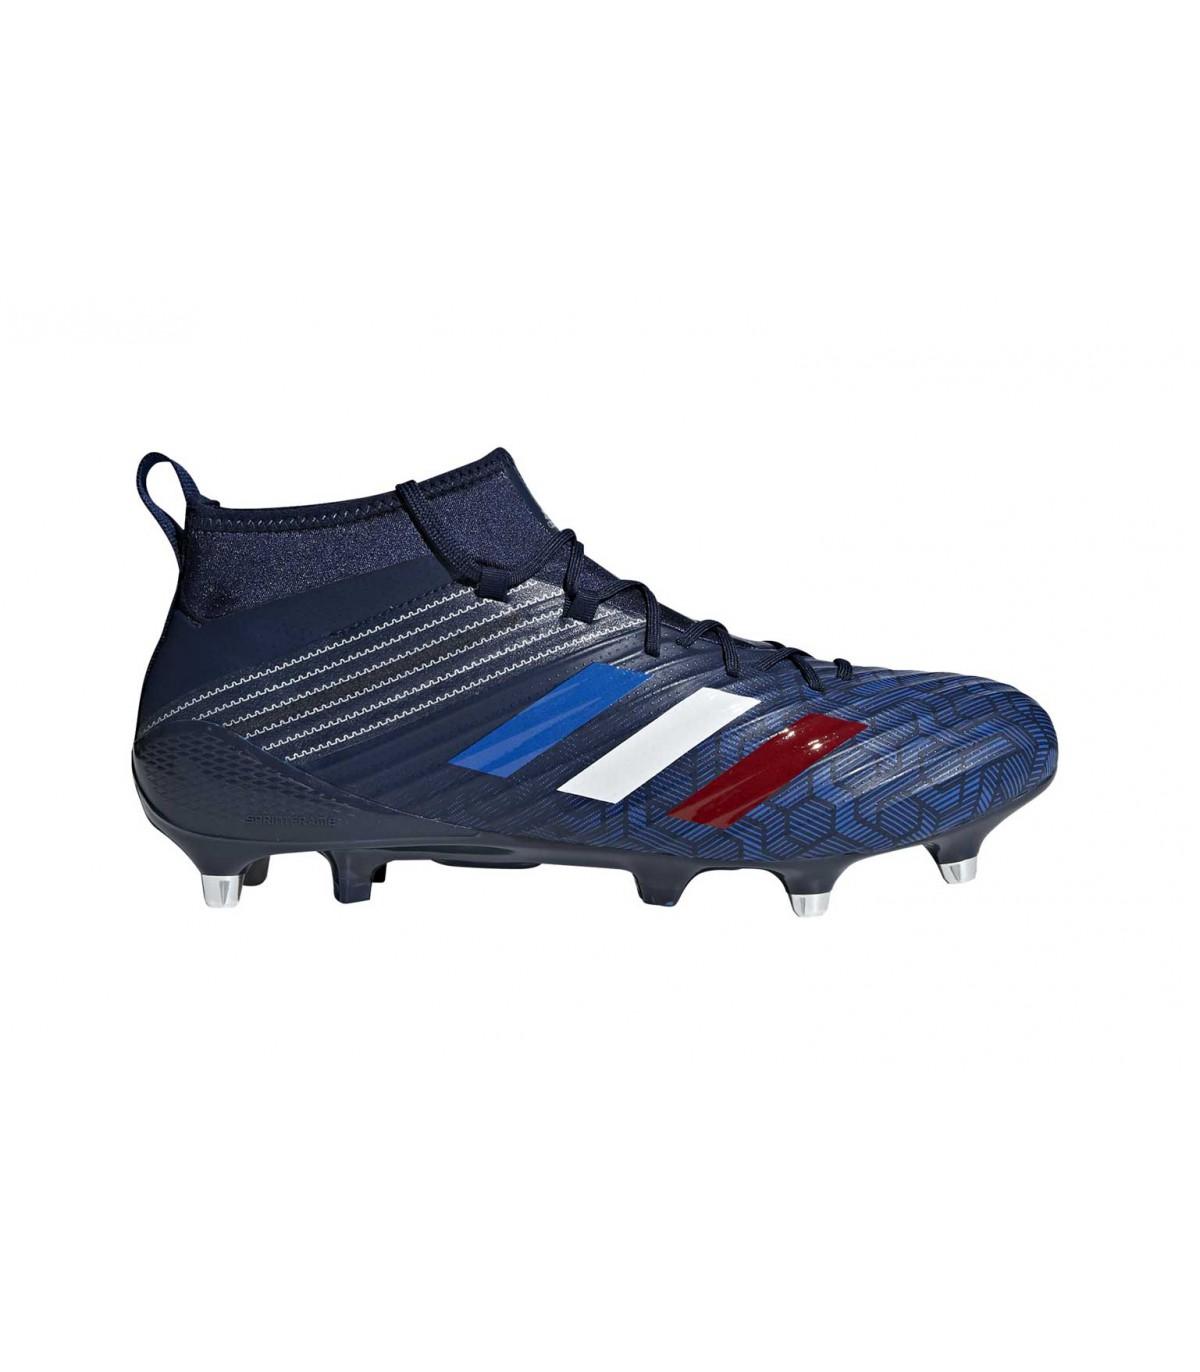 nouveau crampon adidas rugby